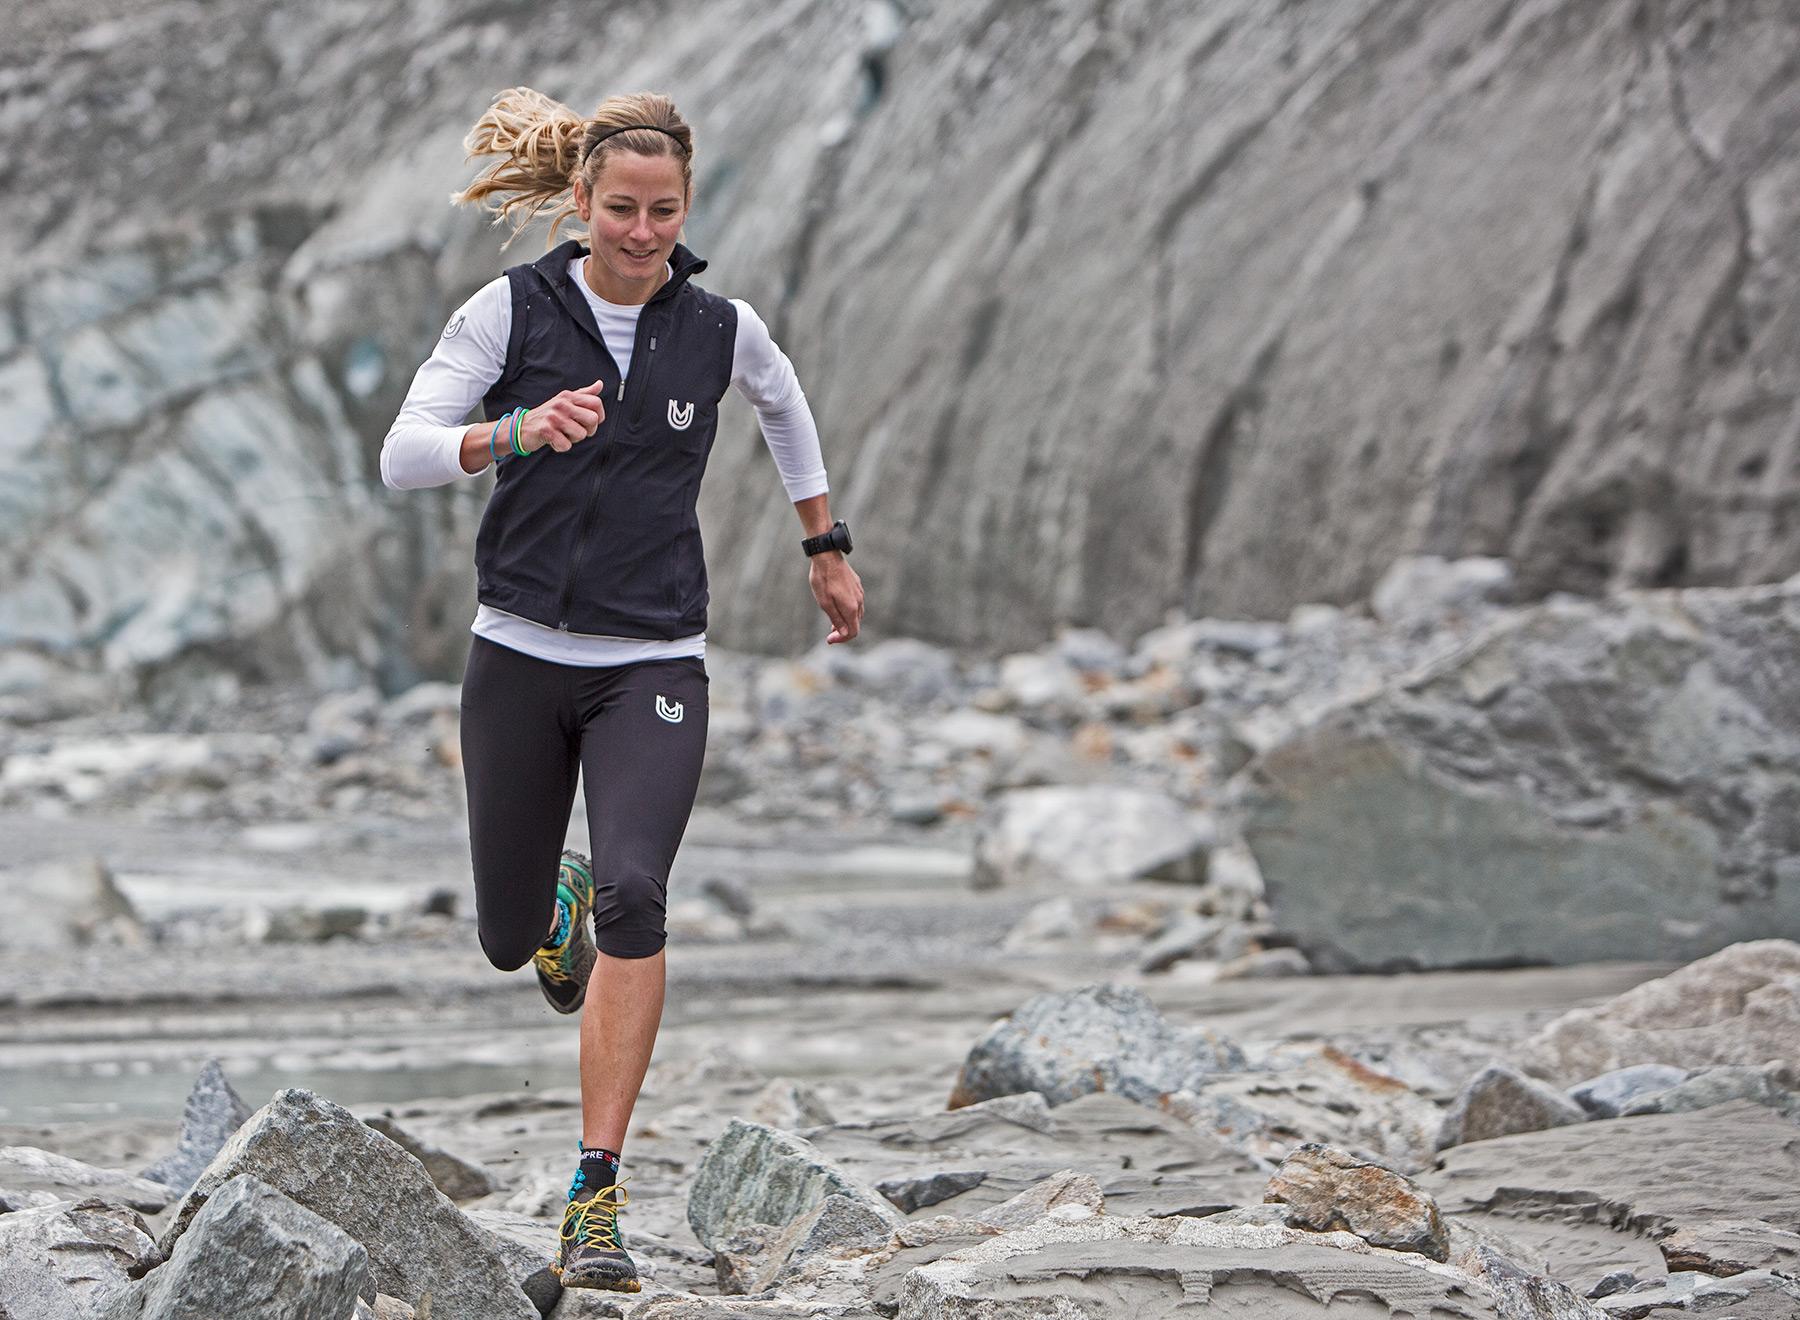 3-UVU-Anne-Marie-Flammersfeld-Running-Engadin